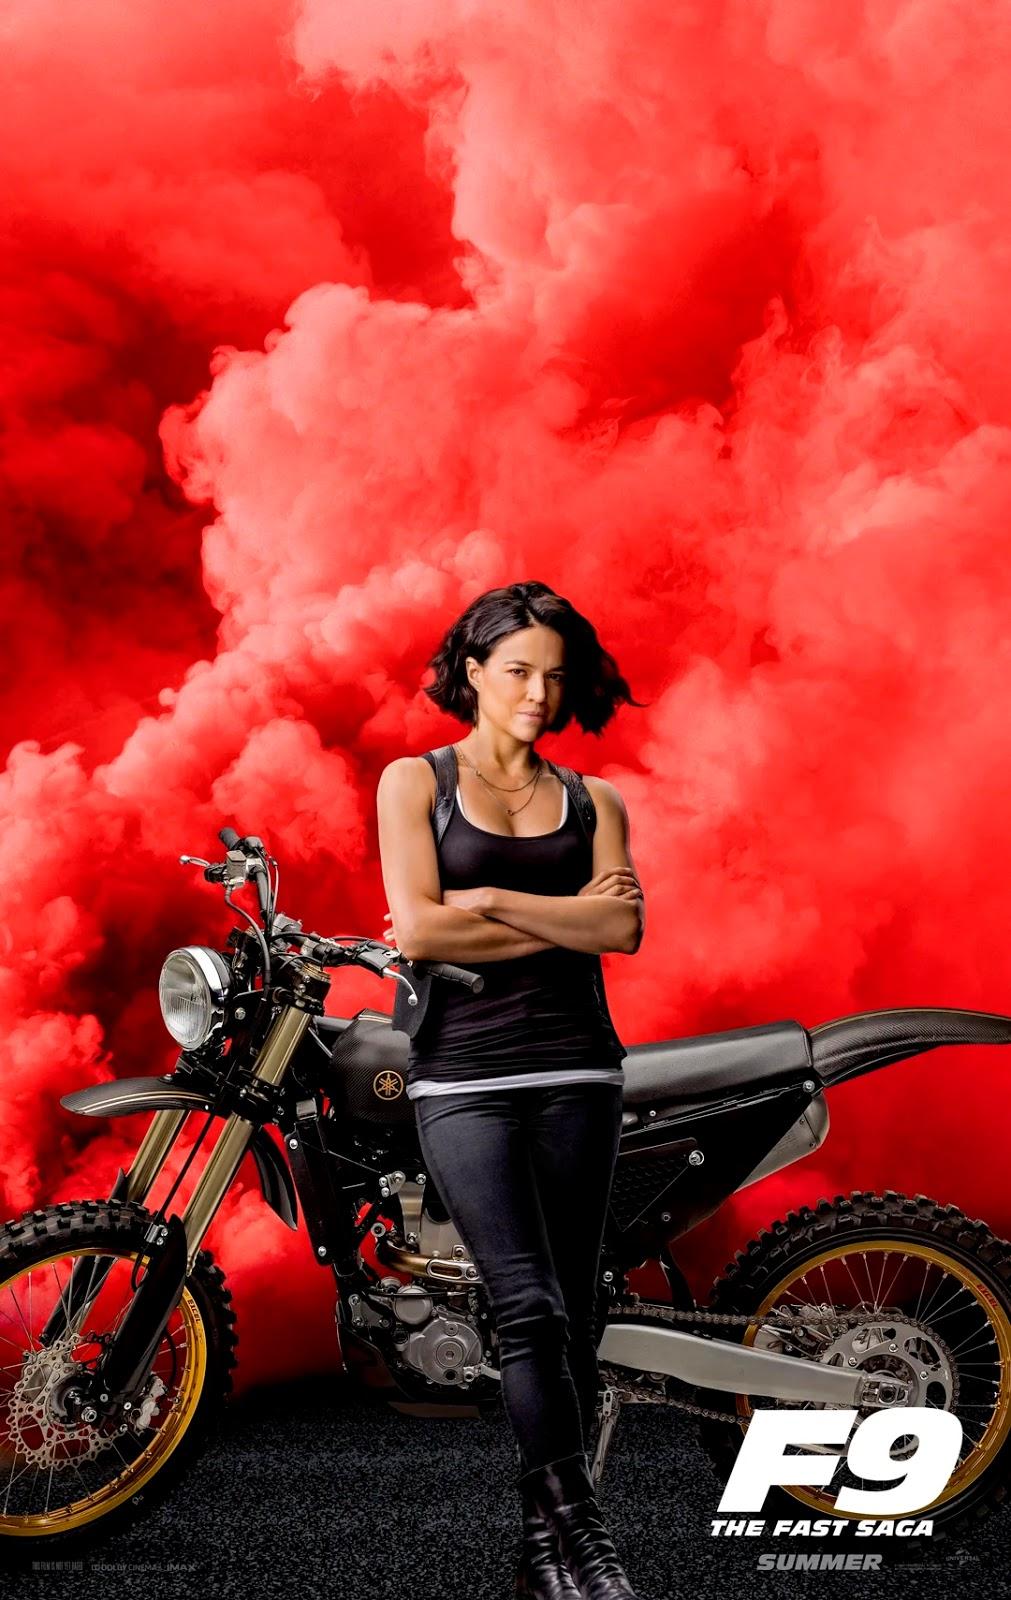 Velozes e Furiosos 9 - Poster Michelle Rodriguez